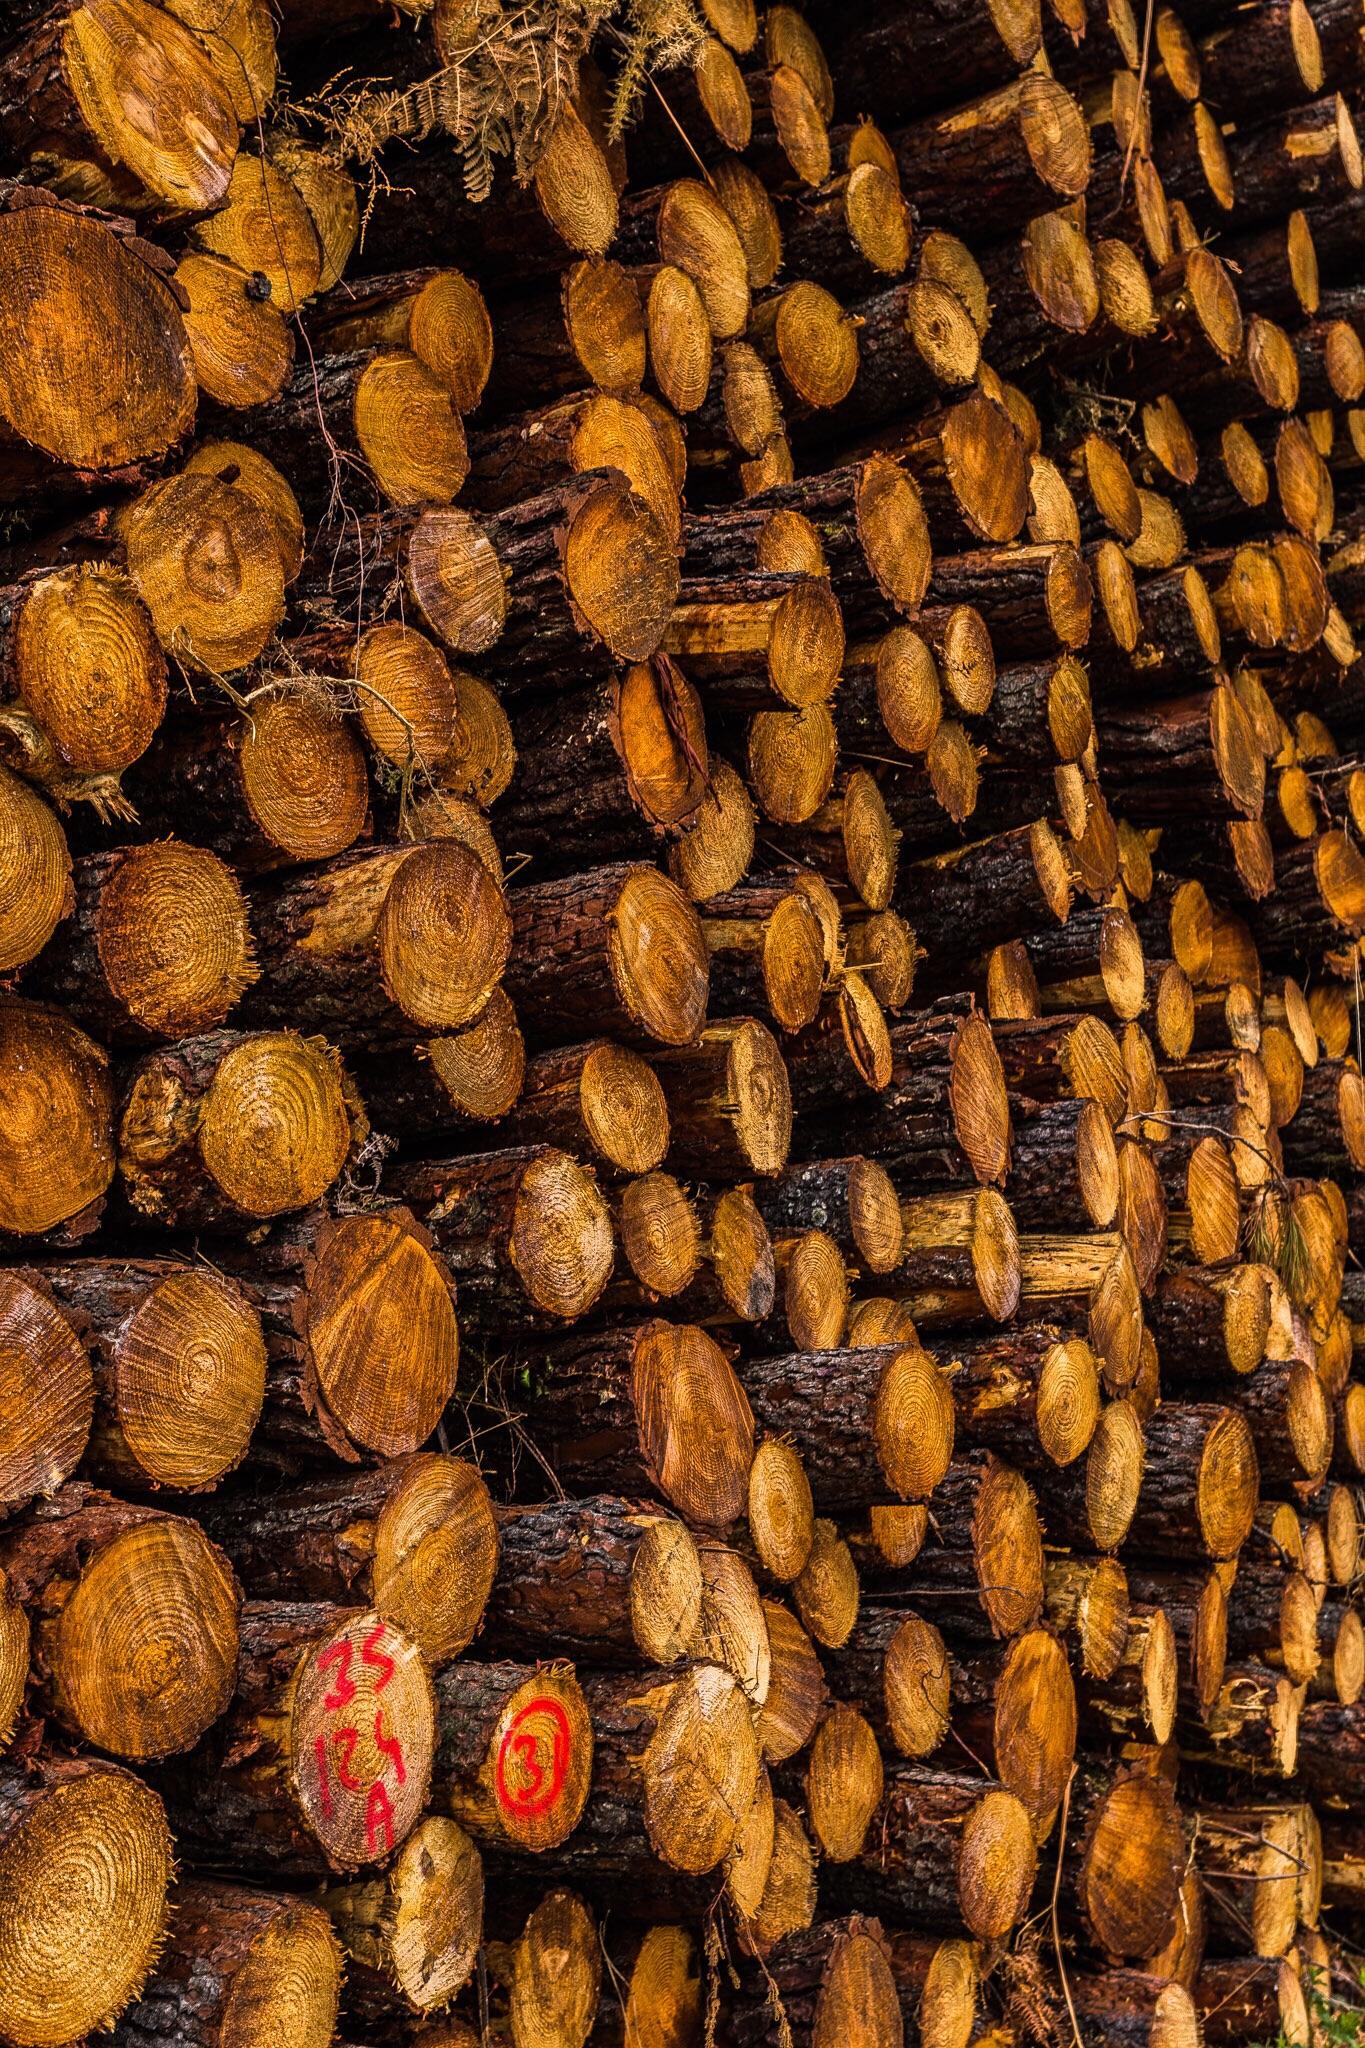 Logs, Aquitane, France, by landscape photographer Rick McEvoy